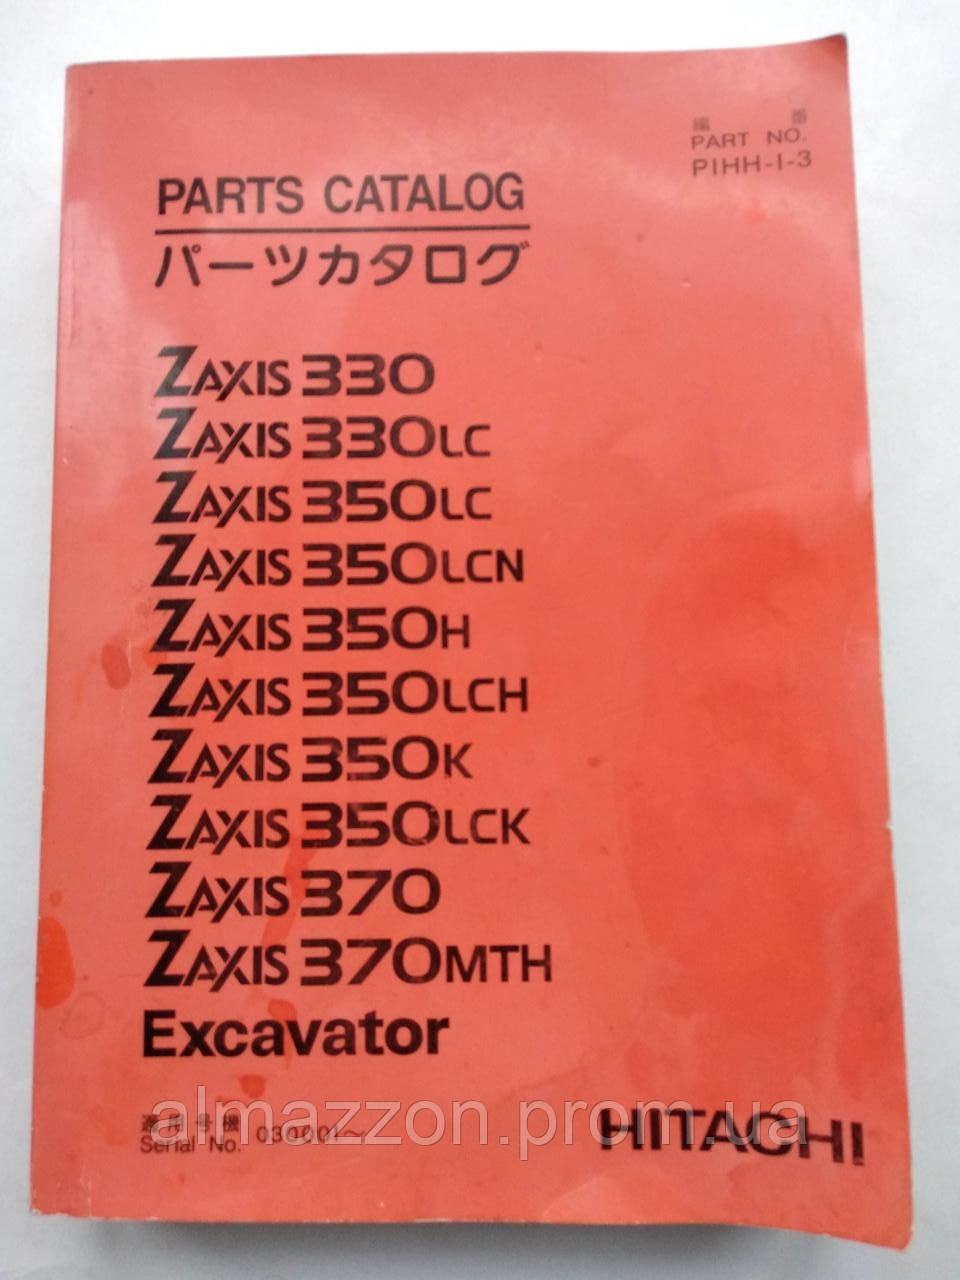 Hitachi Zaxis 330, 330lc, 350 lc, 350 lcn, 350k, 350lck, 370 370mth Экскаватор Каталог запчастей Excavator